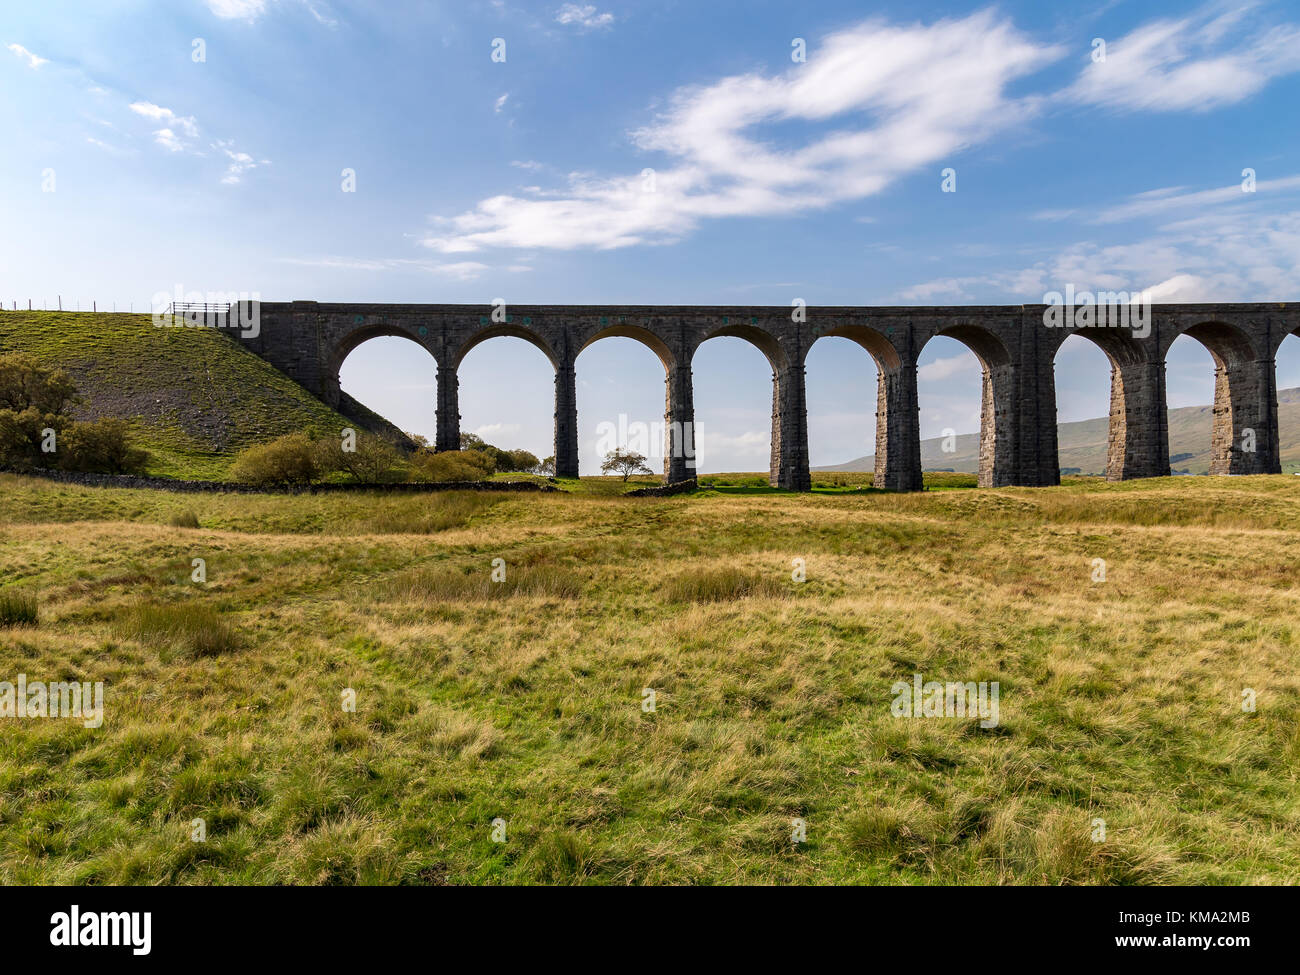 Ribblehead Viaduct, near Ingleton, Yorkshire Dales, North Yorkshire, UK - Stock Image